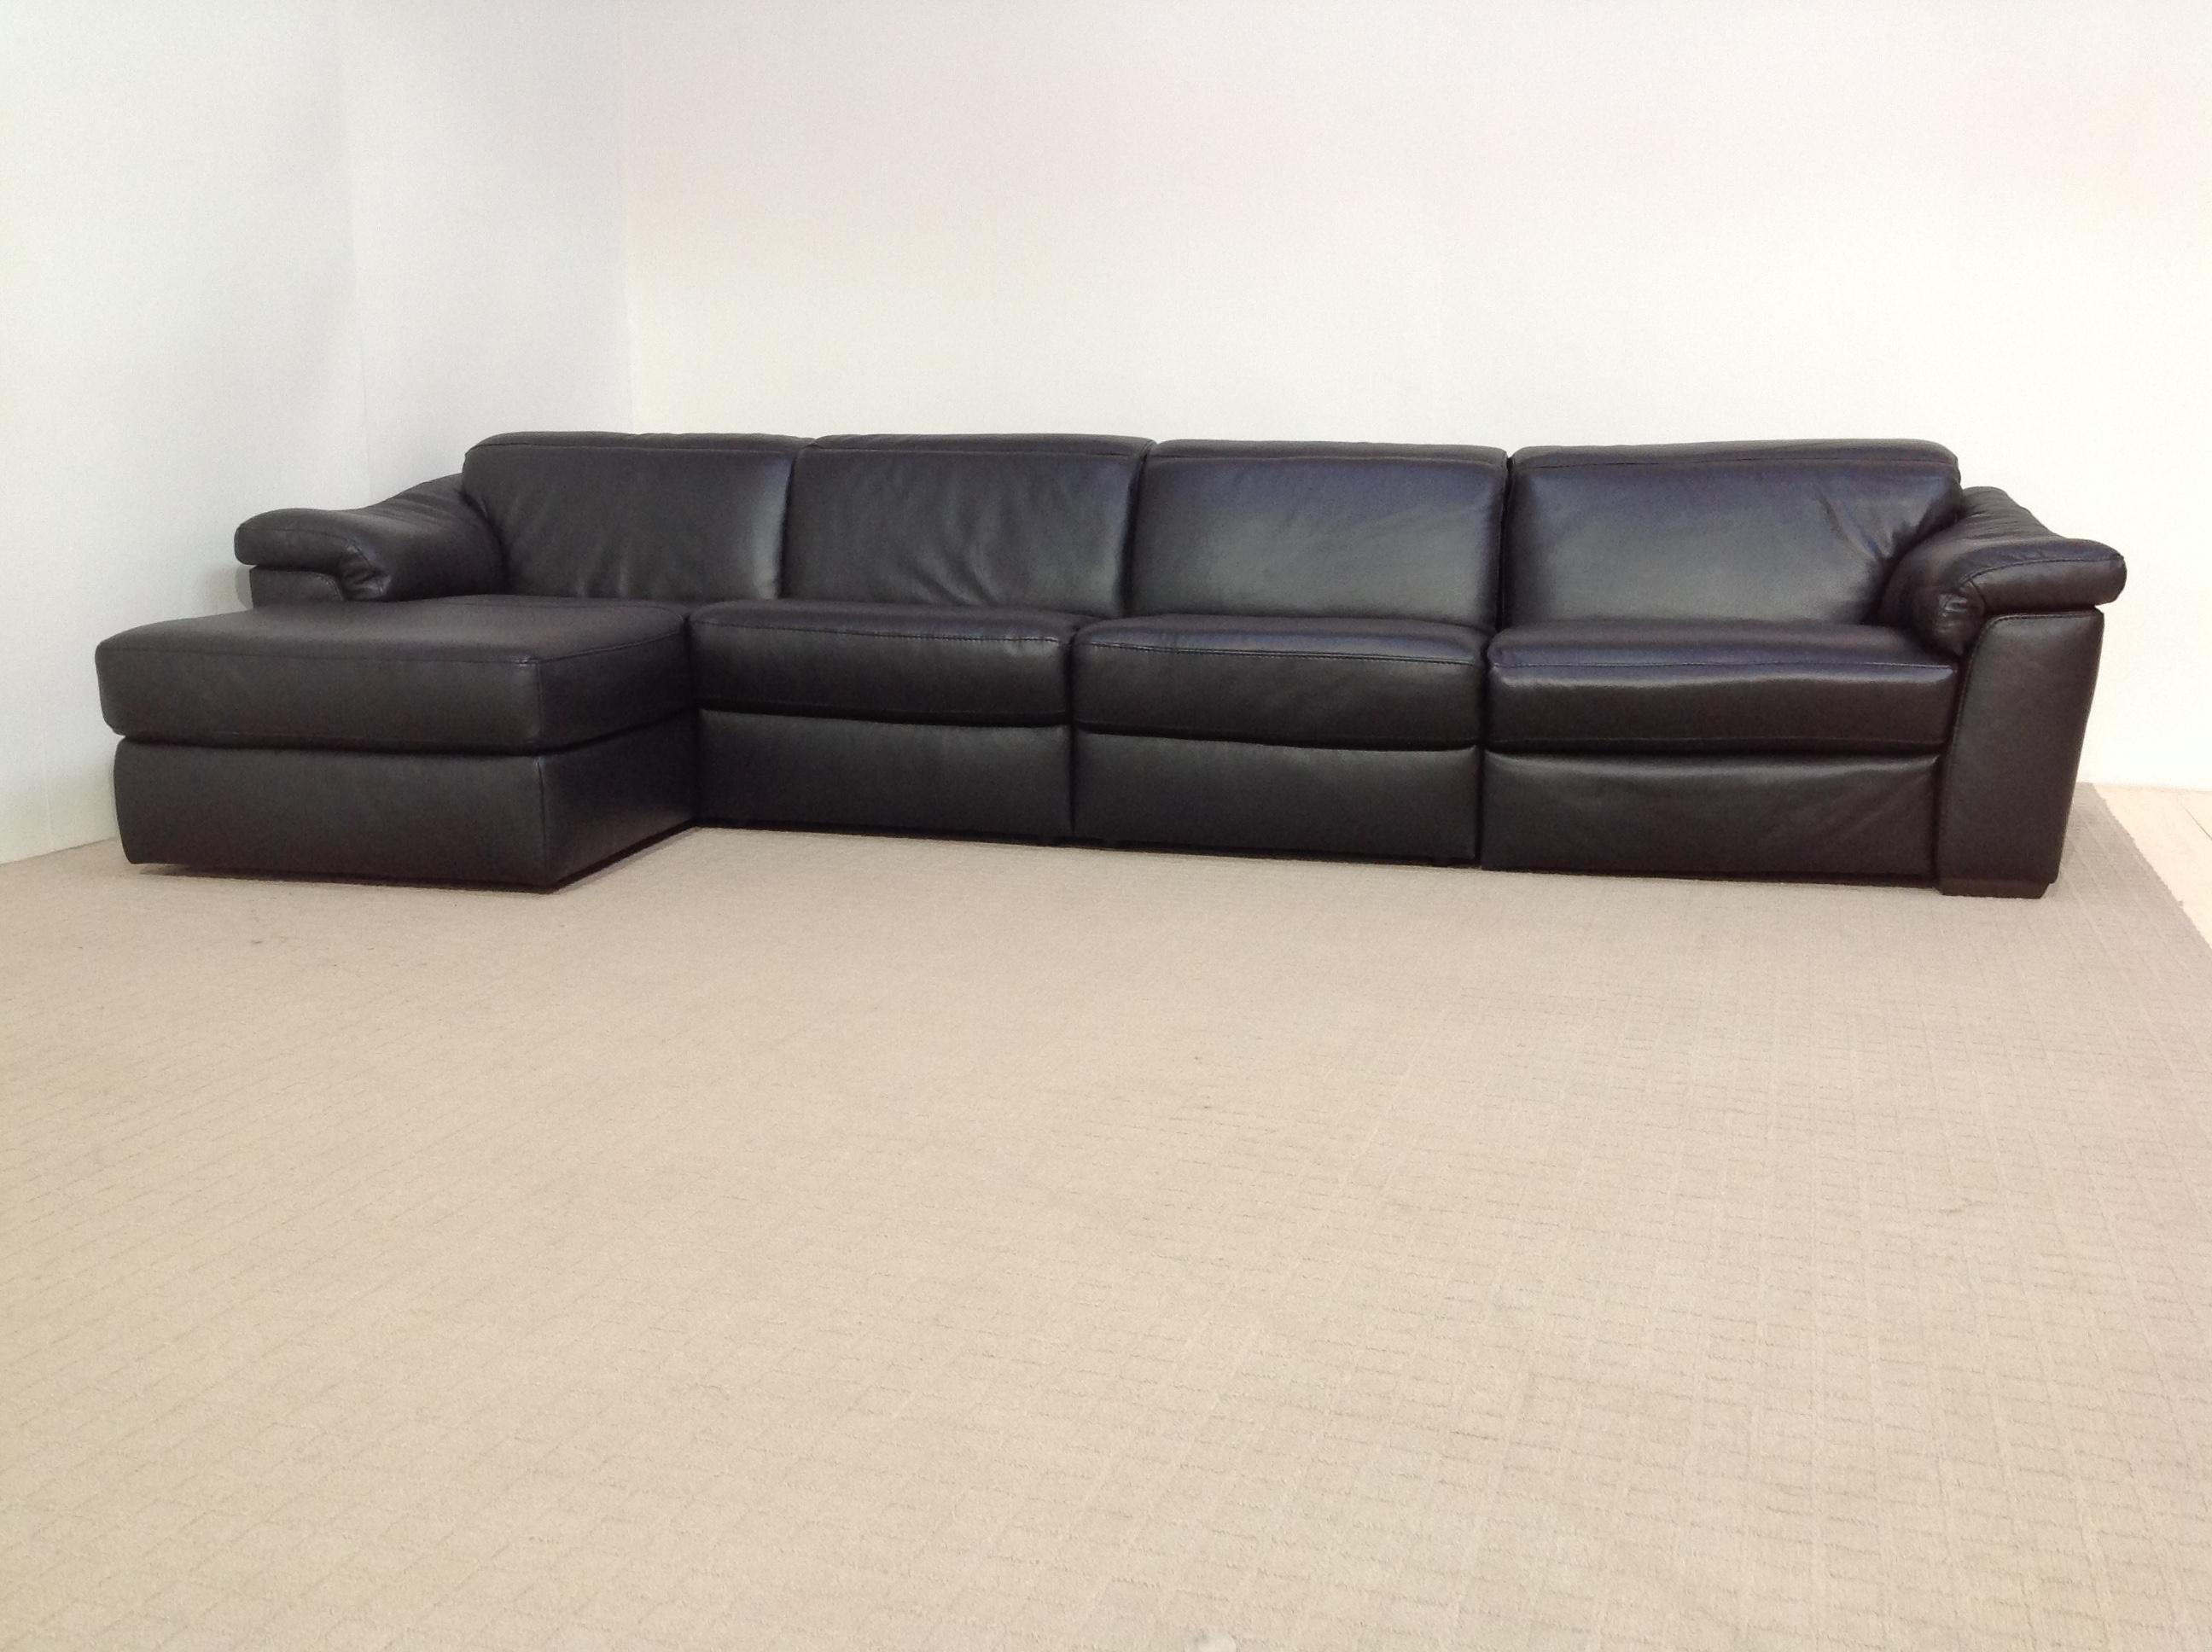 natuzzi sofa bed clearance low modular edition sensor b760 power black full leather 4